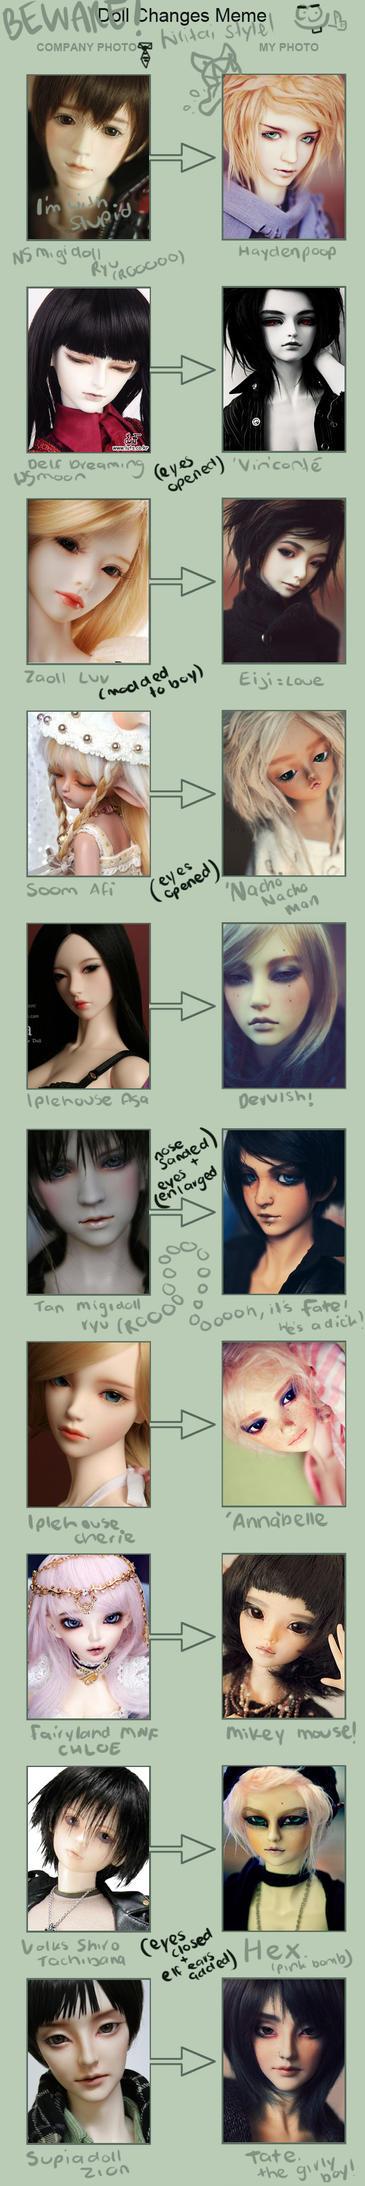 Doll Changes Meme by hiritai